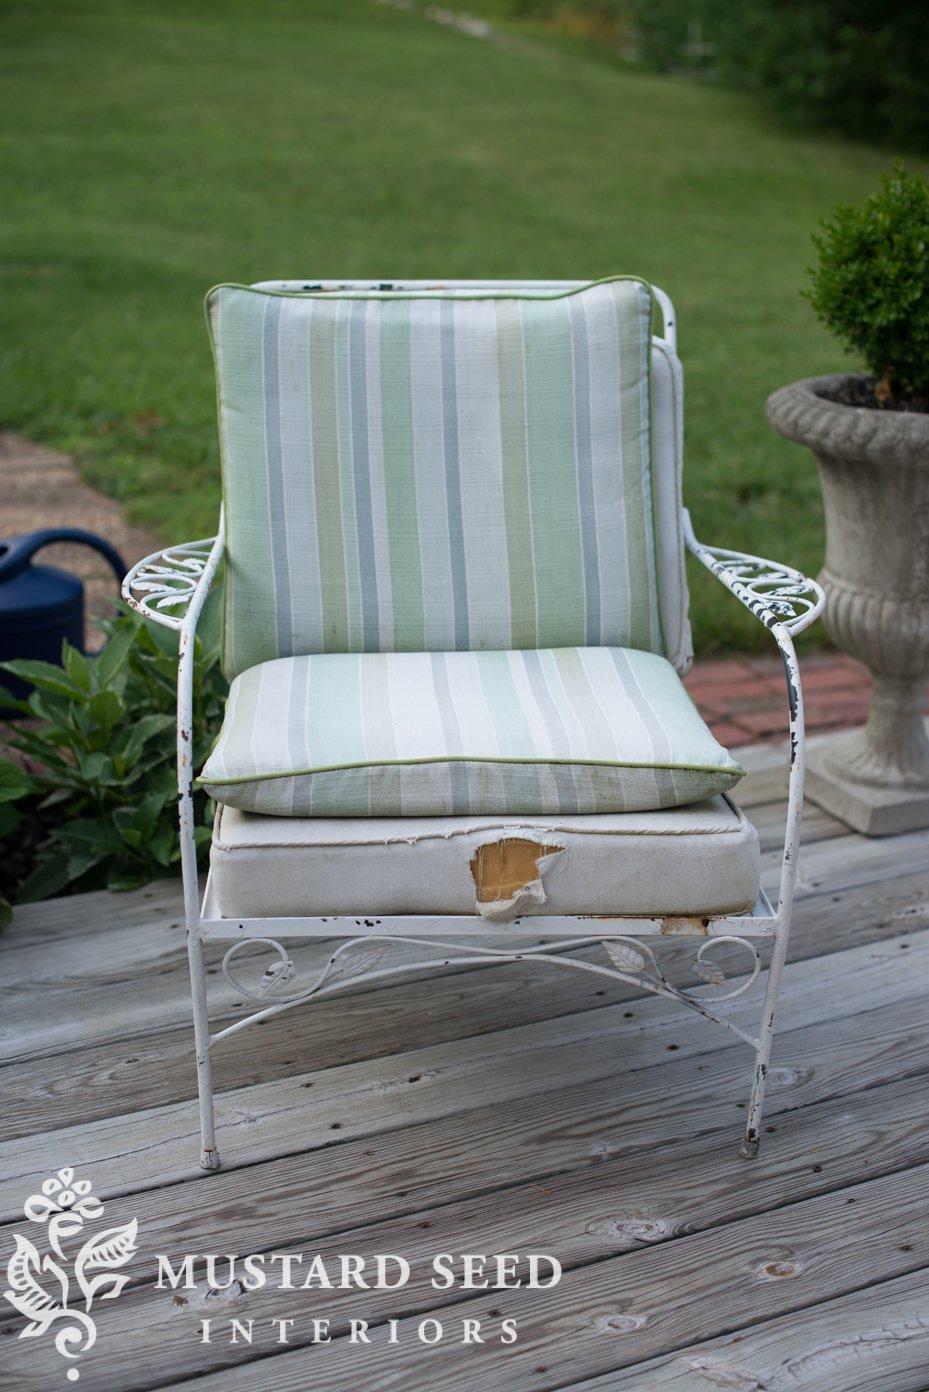 How To Make A Chair Cushion Deck Chair Makeover